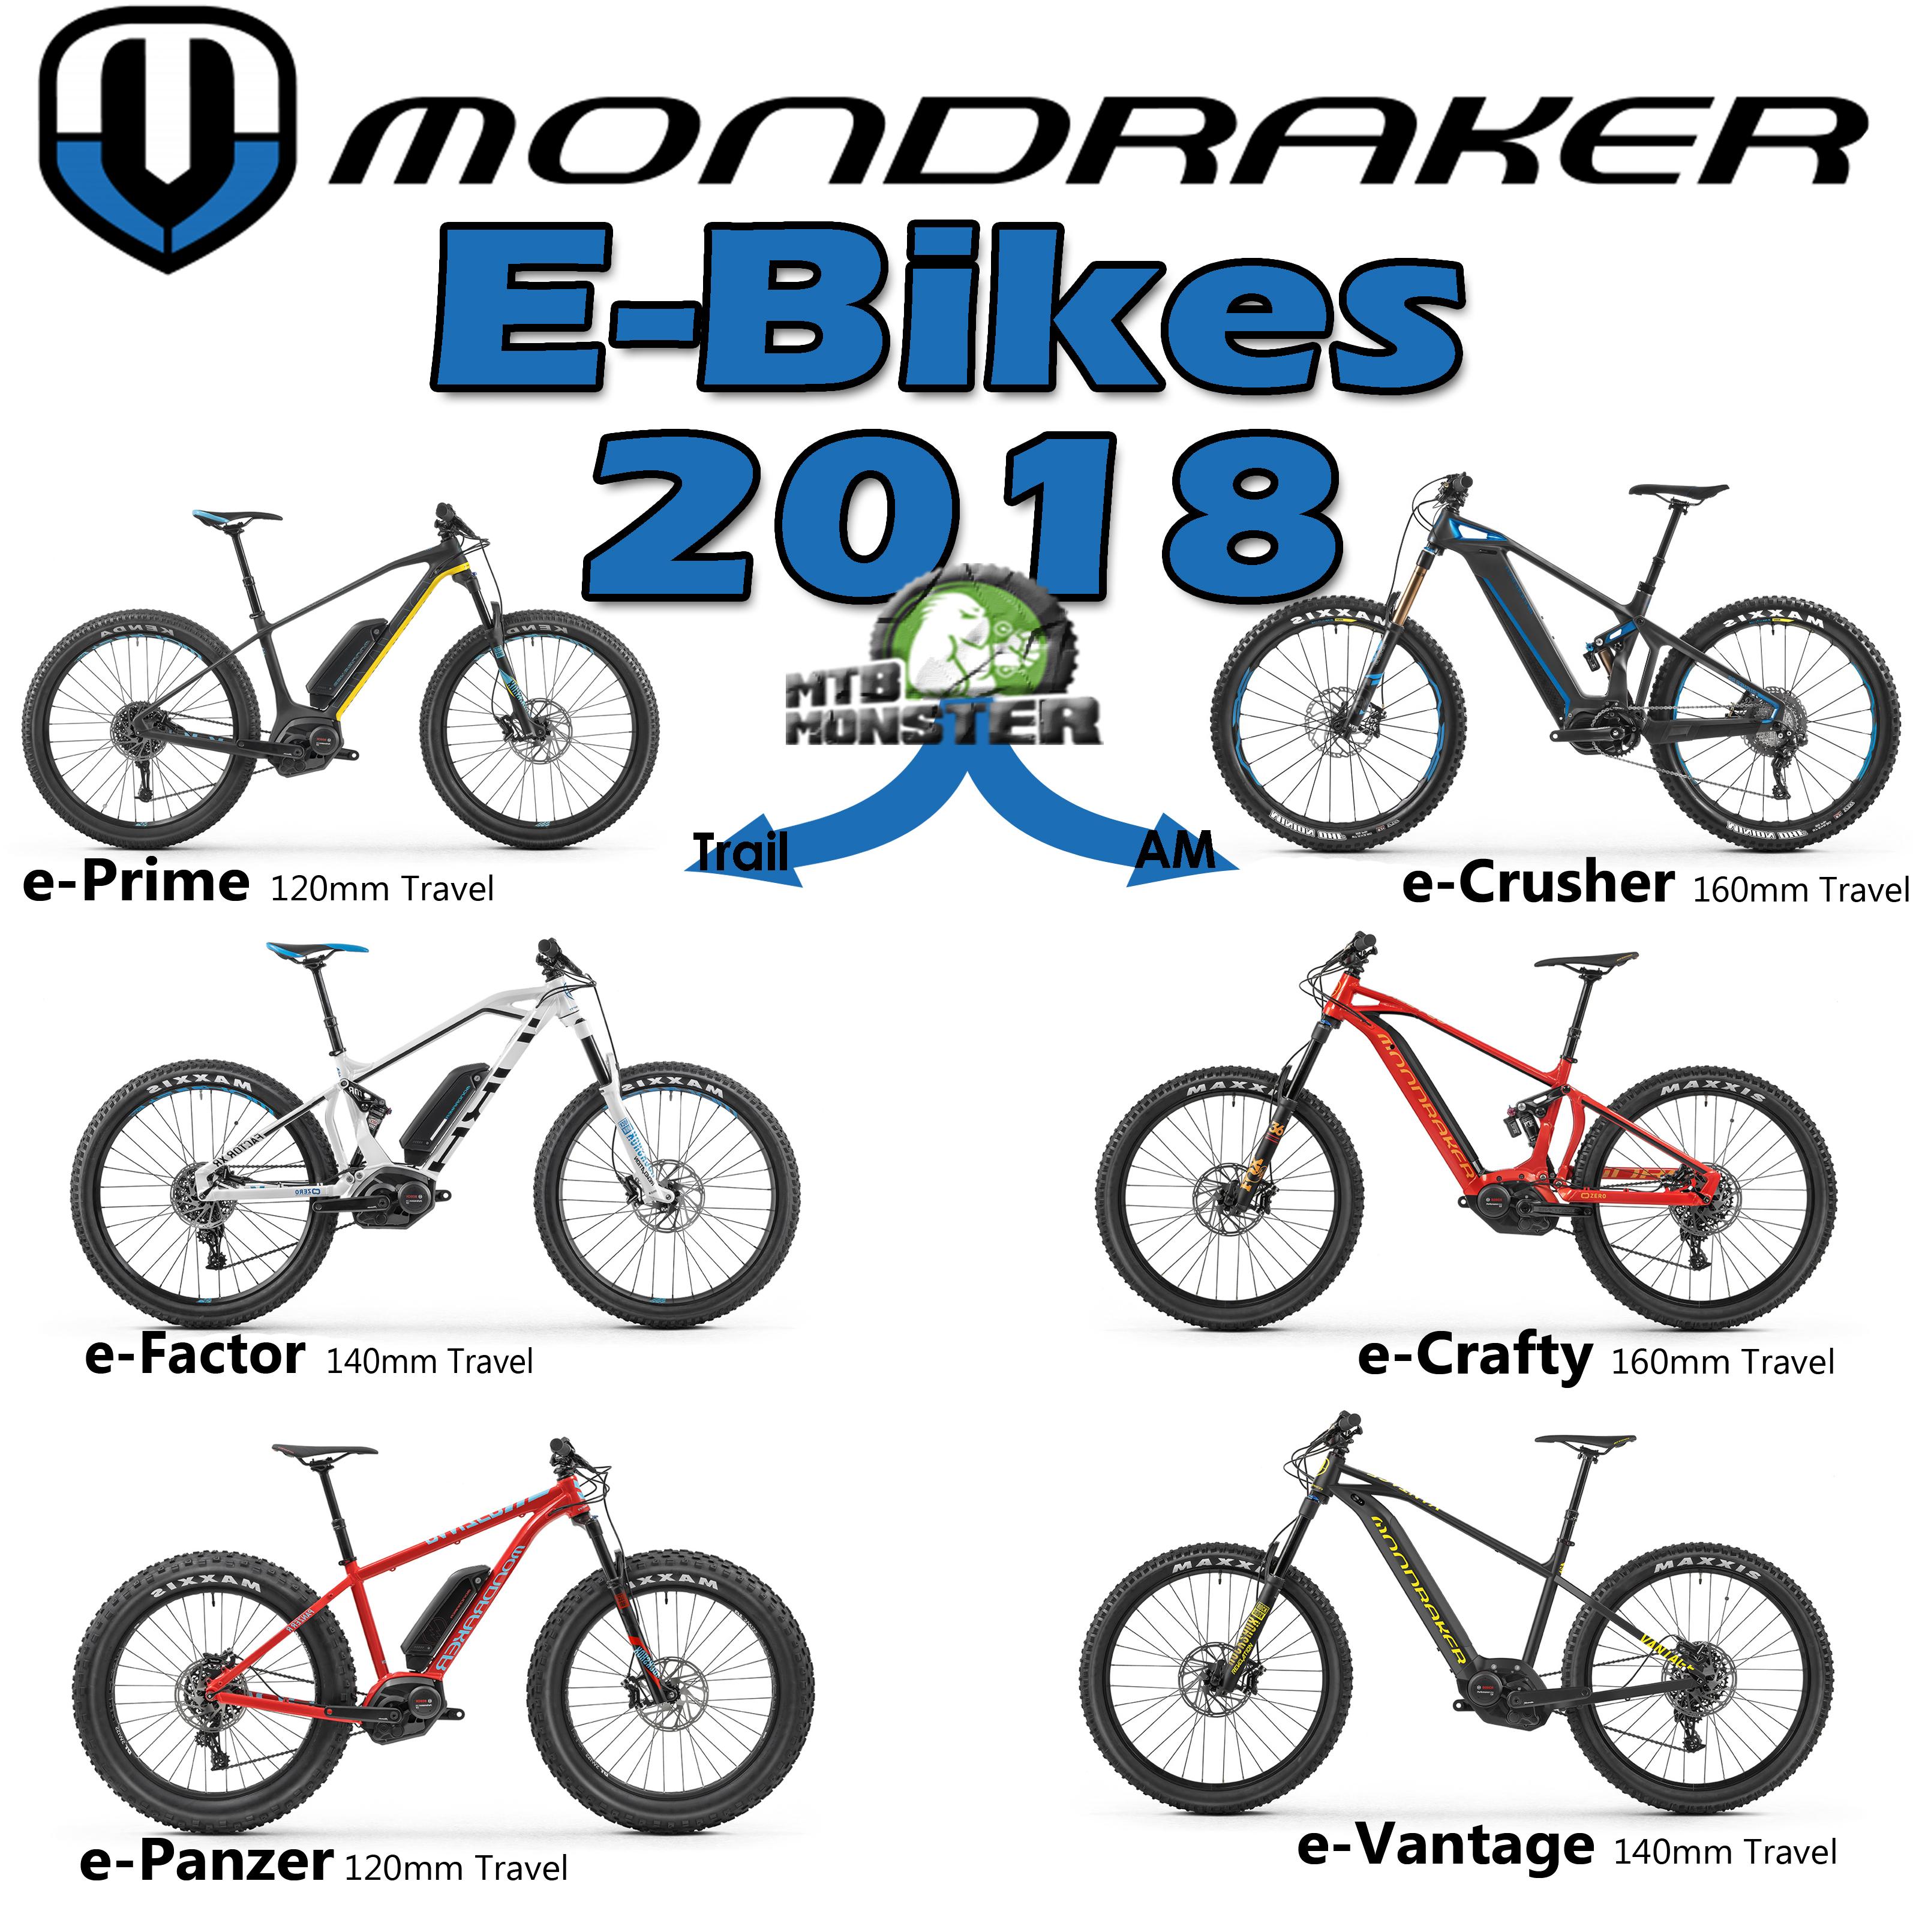 2018-mondraker-ebikes-range-and-information-and-guide-ukdealer-mtb-monster.jpg